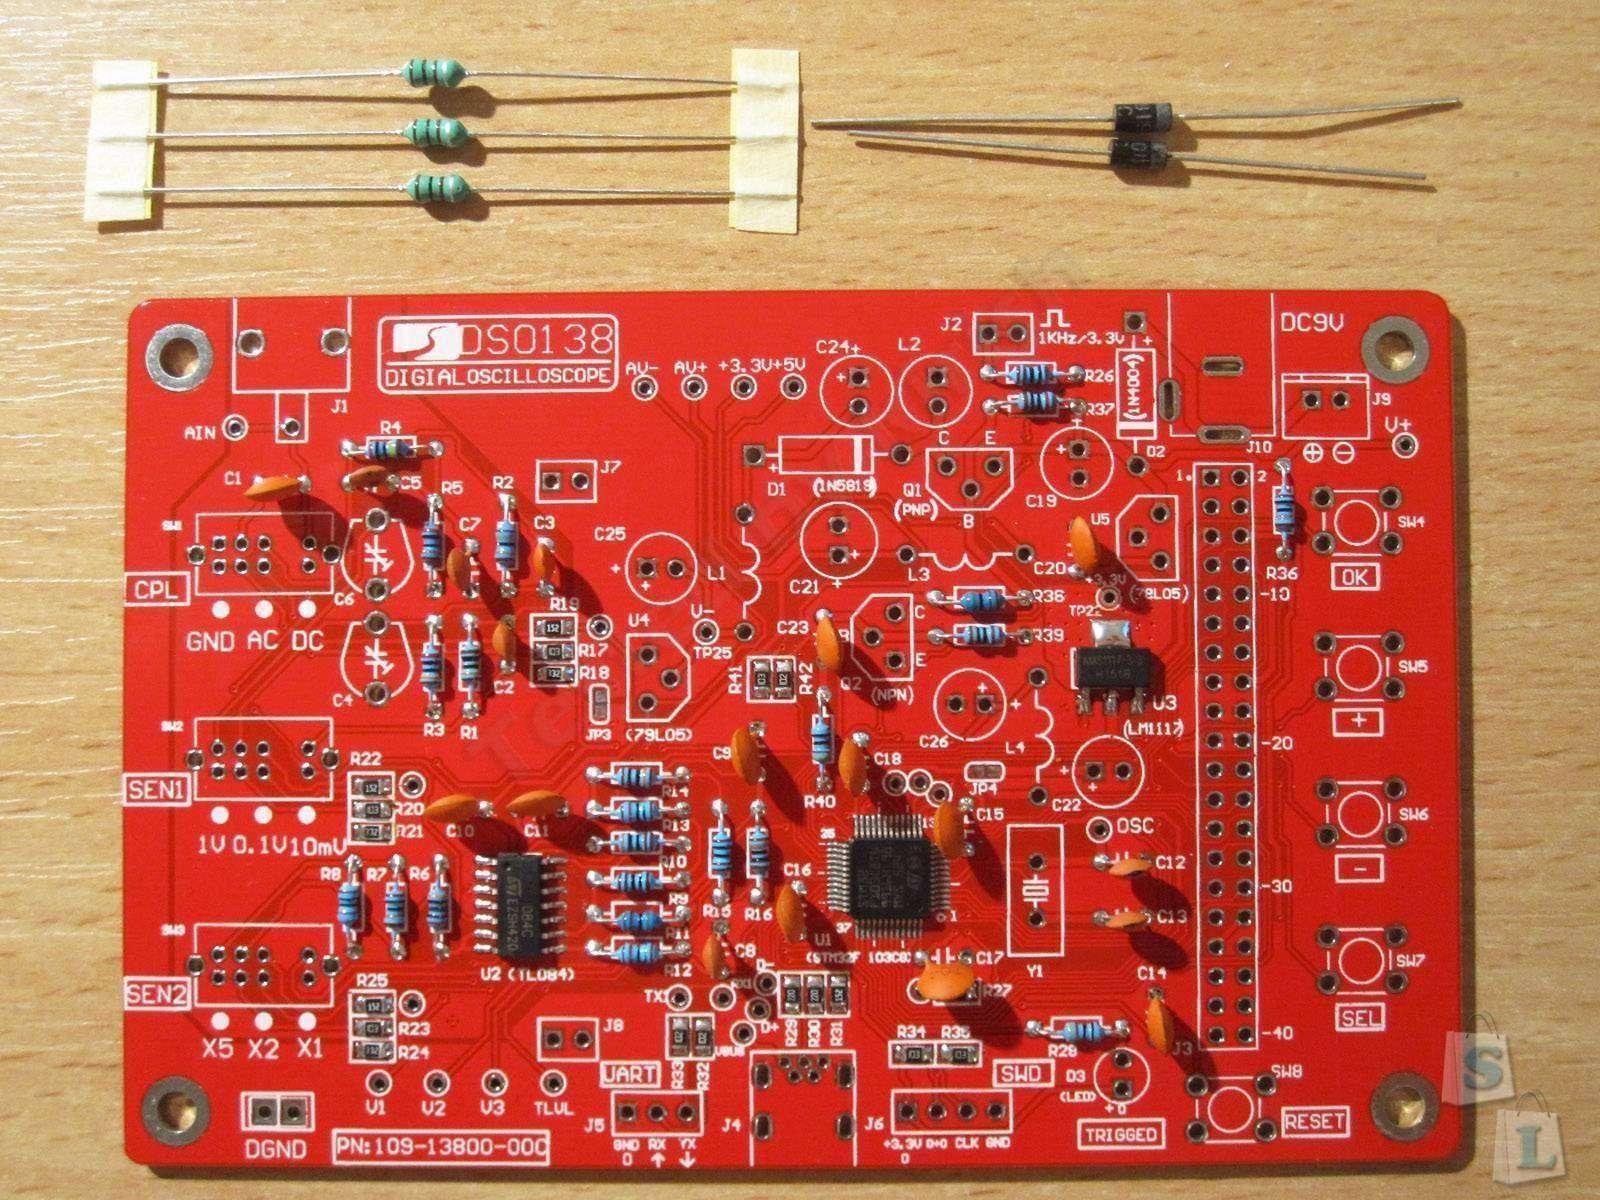 GearBest: Осциллограф своими руками, реально? Да! DSO138, осциллограф-конструктор